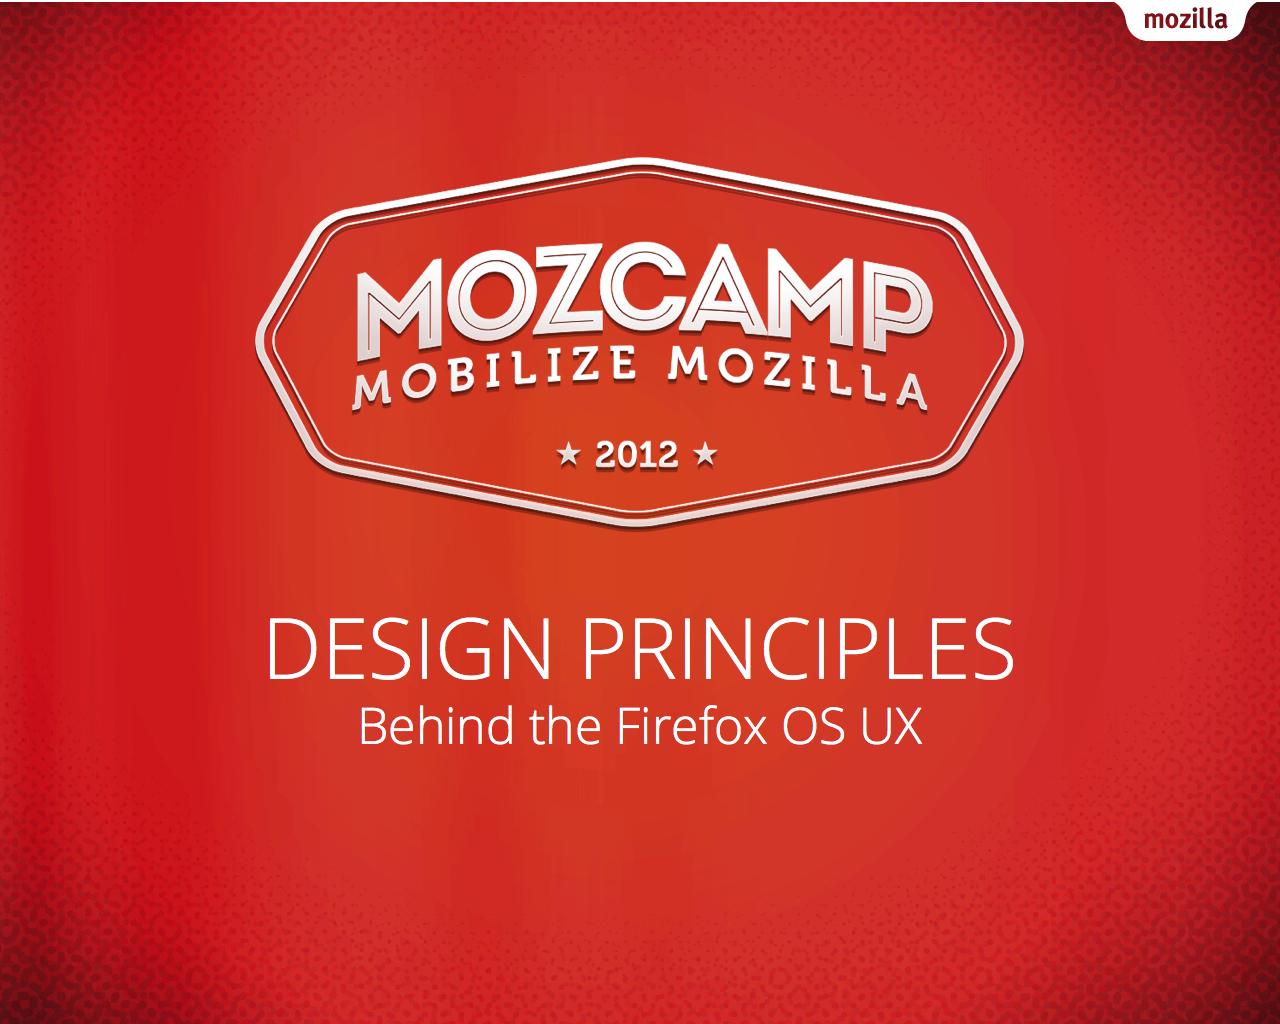 mozilla-mozcamp-firefox-os.001